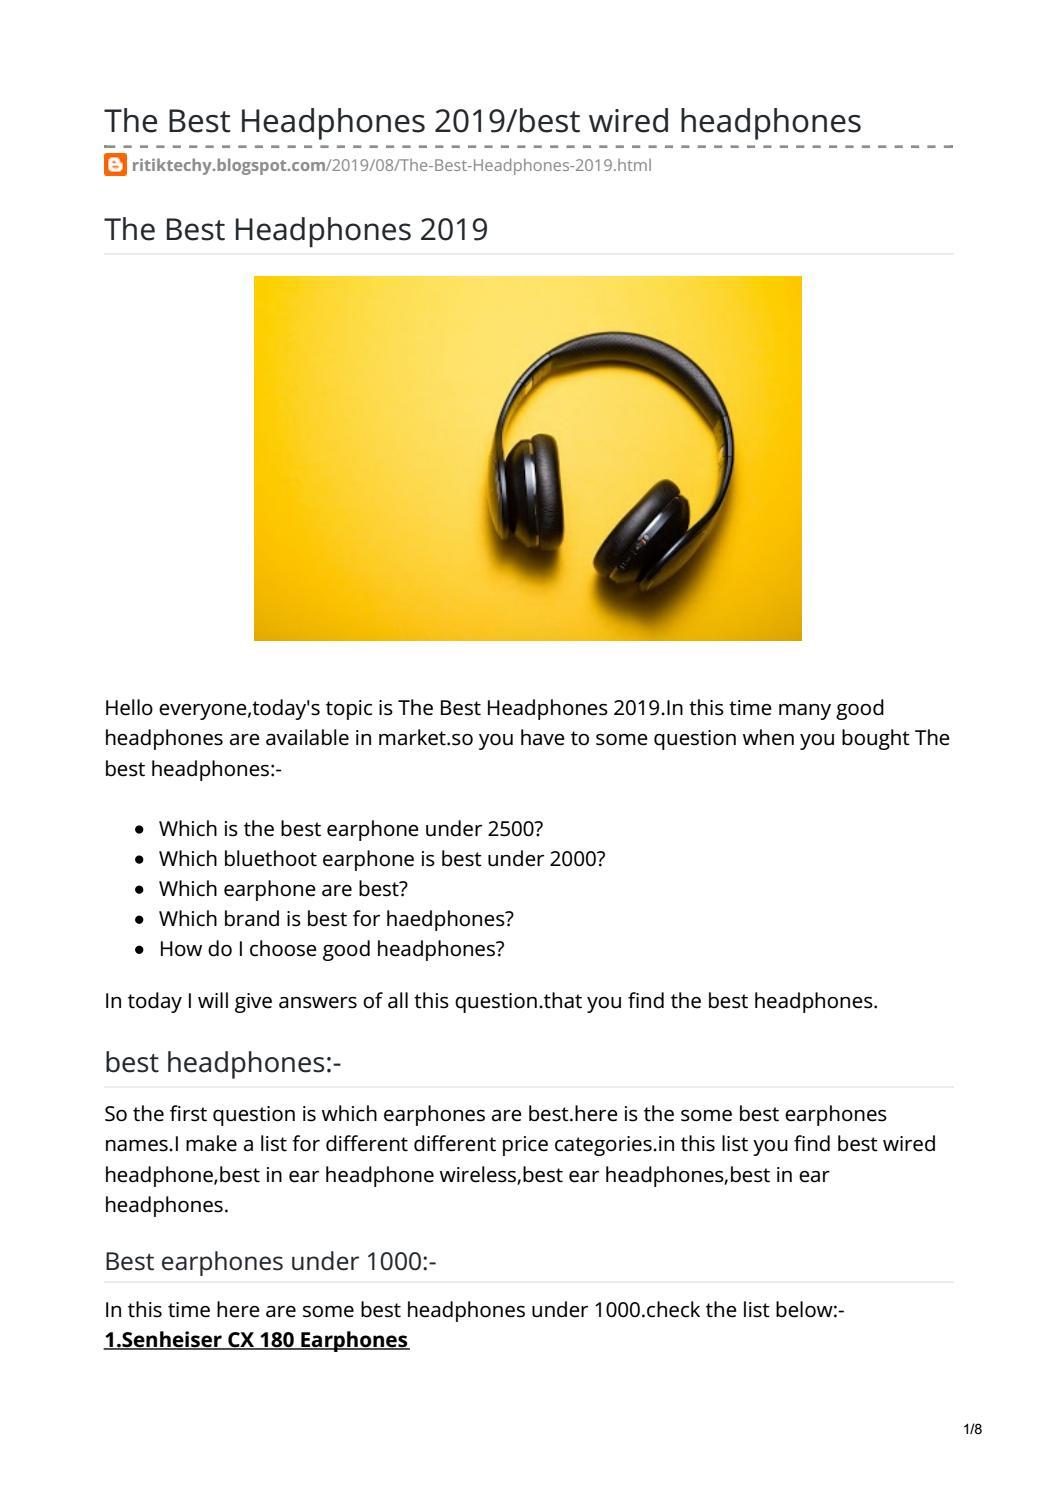 The Best Headphones 2019 Best Headphones List Are Here By Ritikdewangan67 Issuu